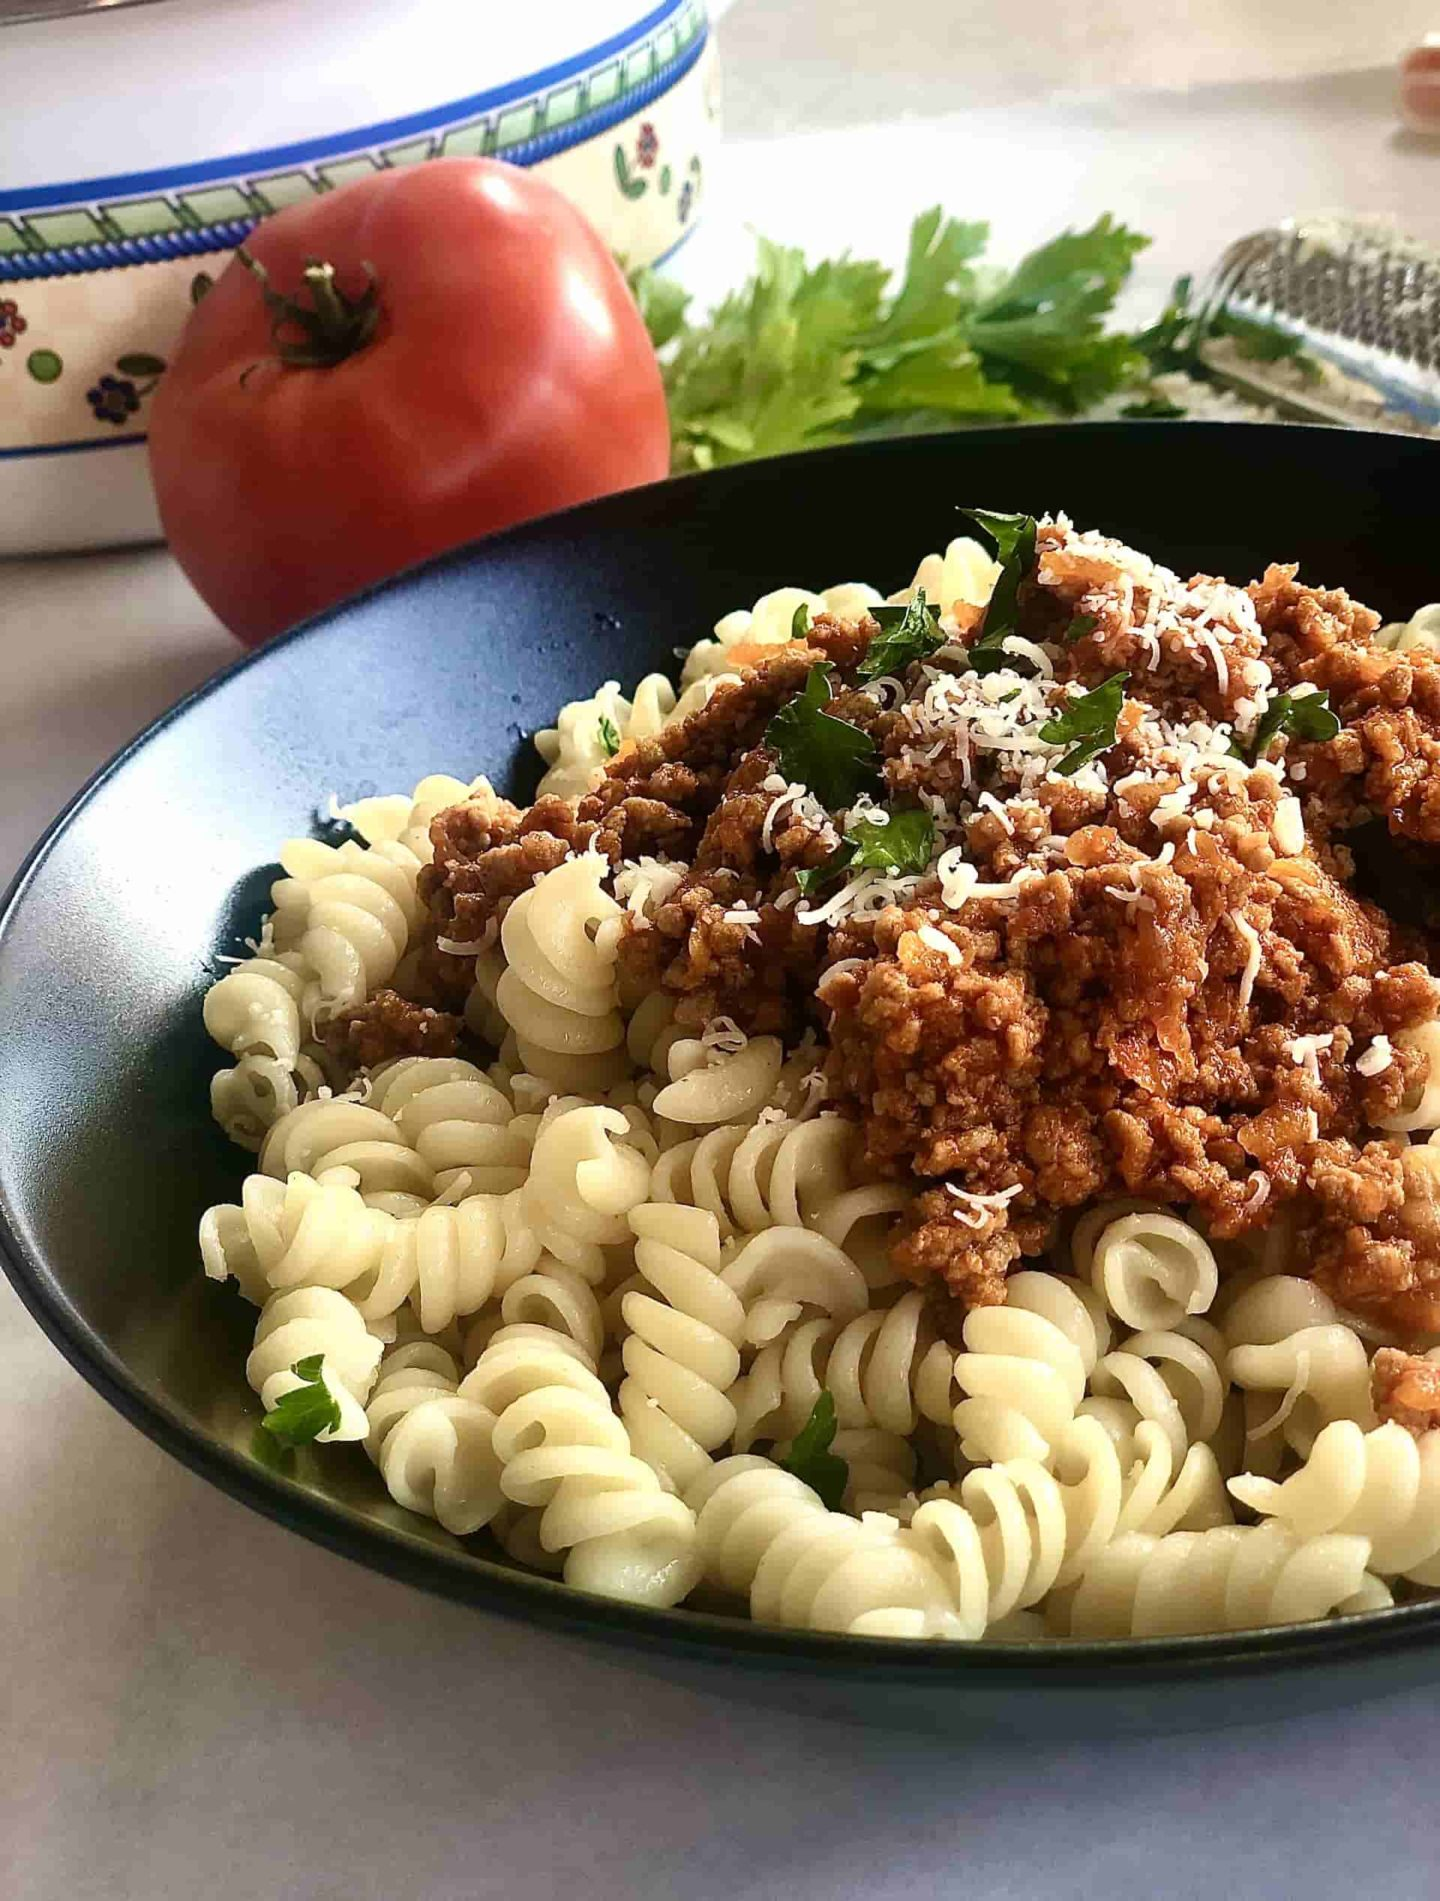 grcka-kuhinja-najbolji-bolognese-ikada-2